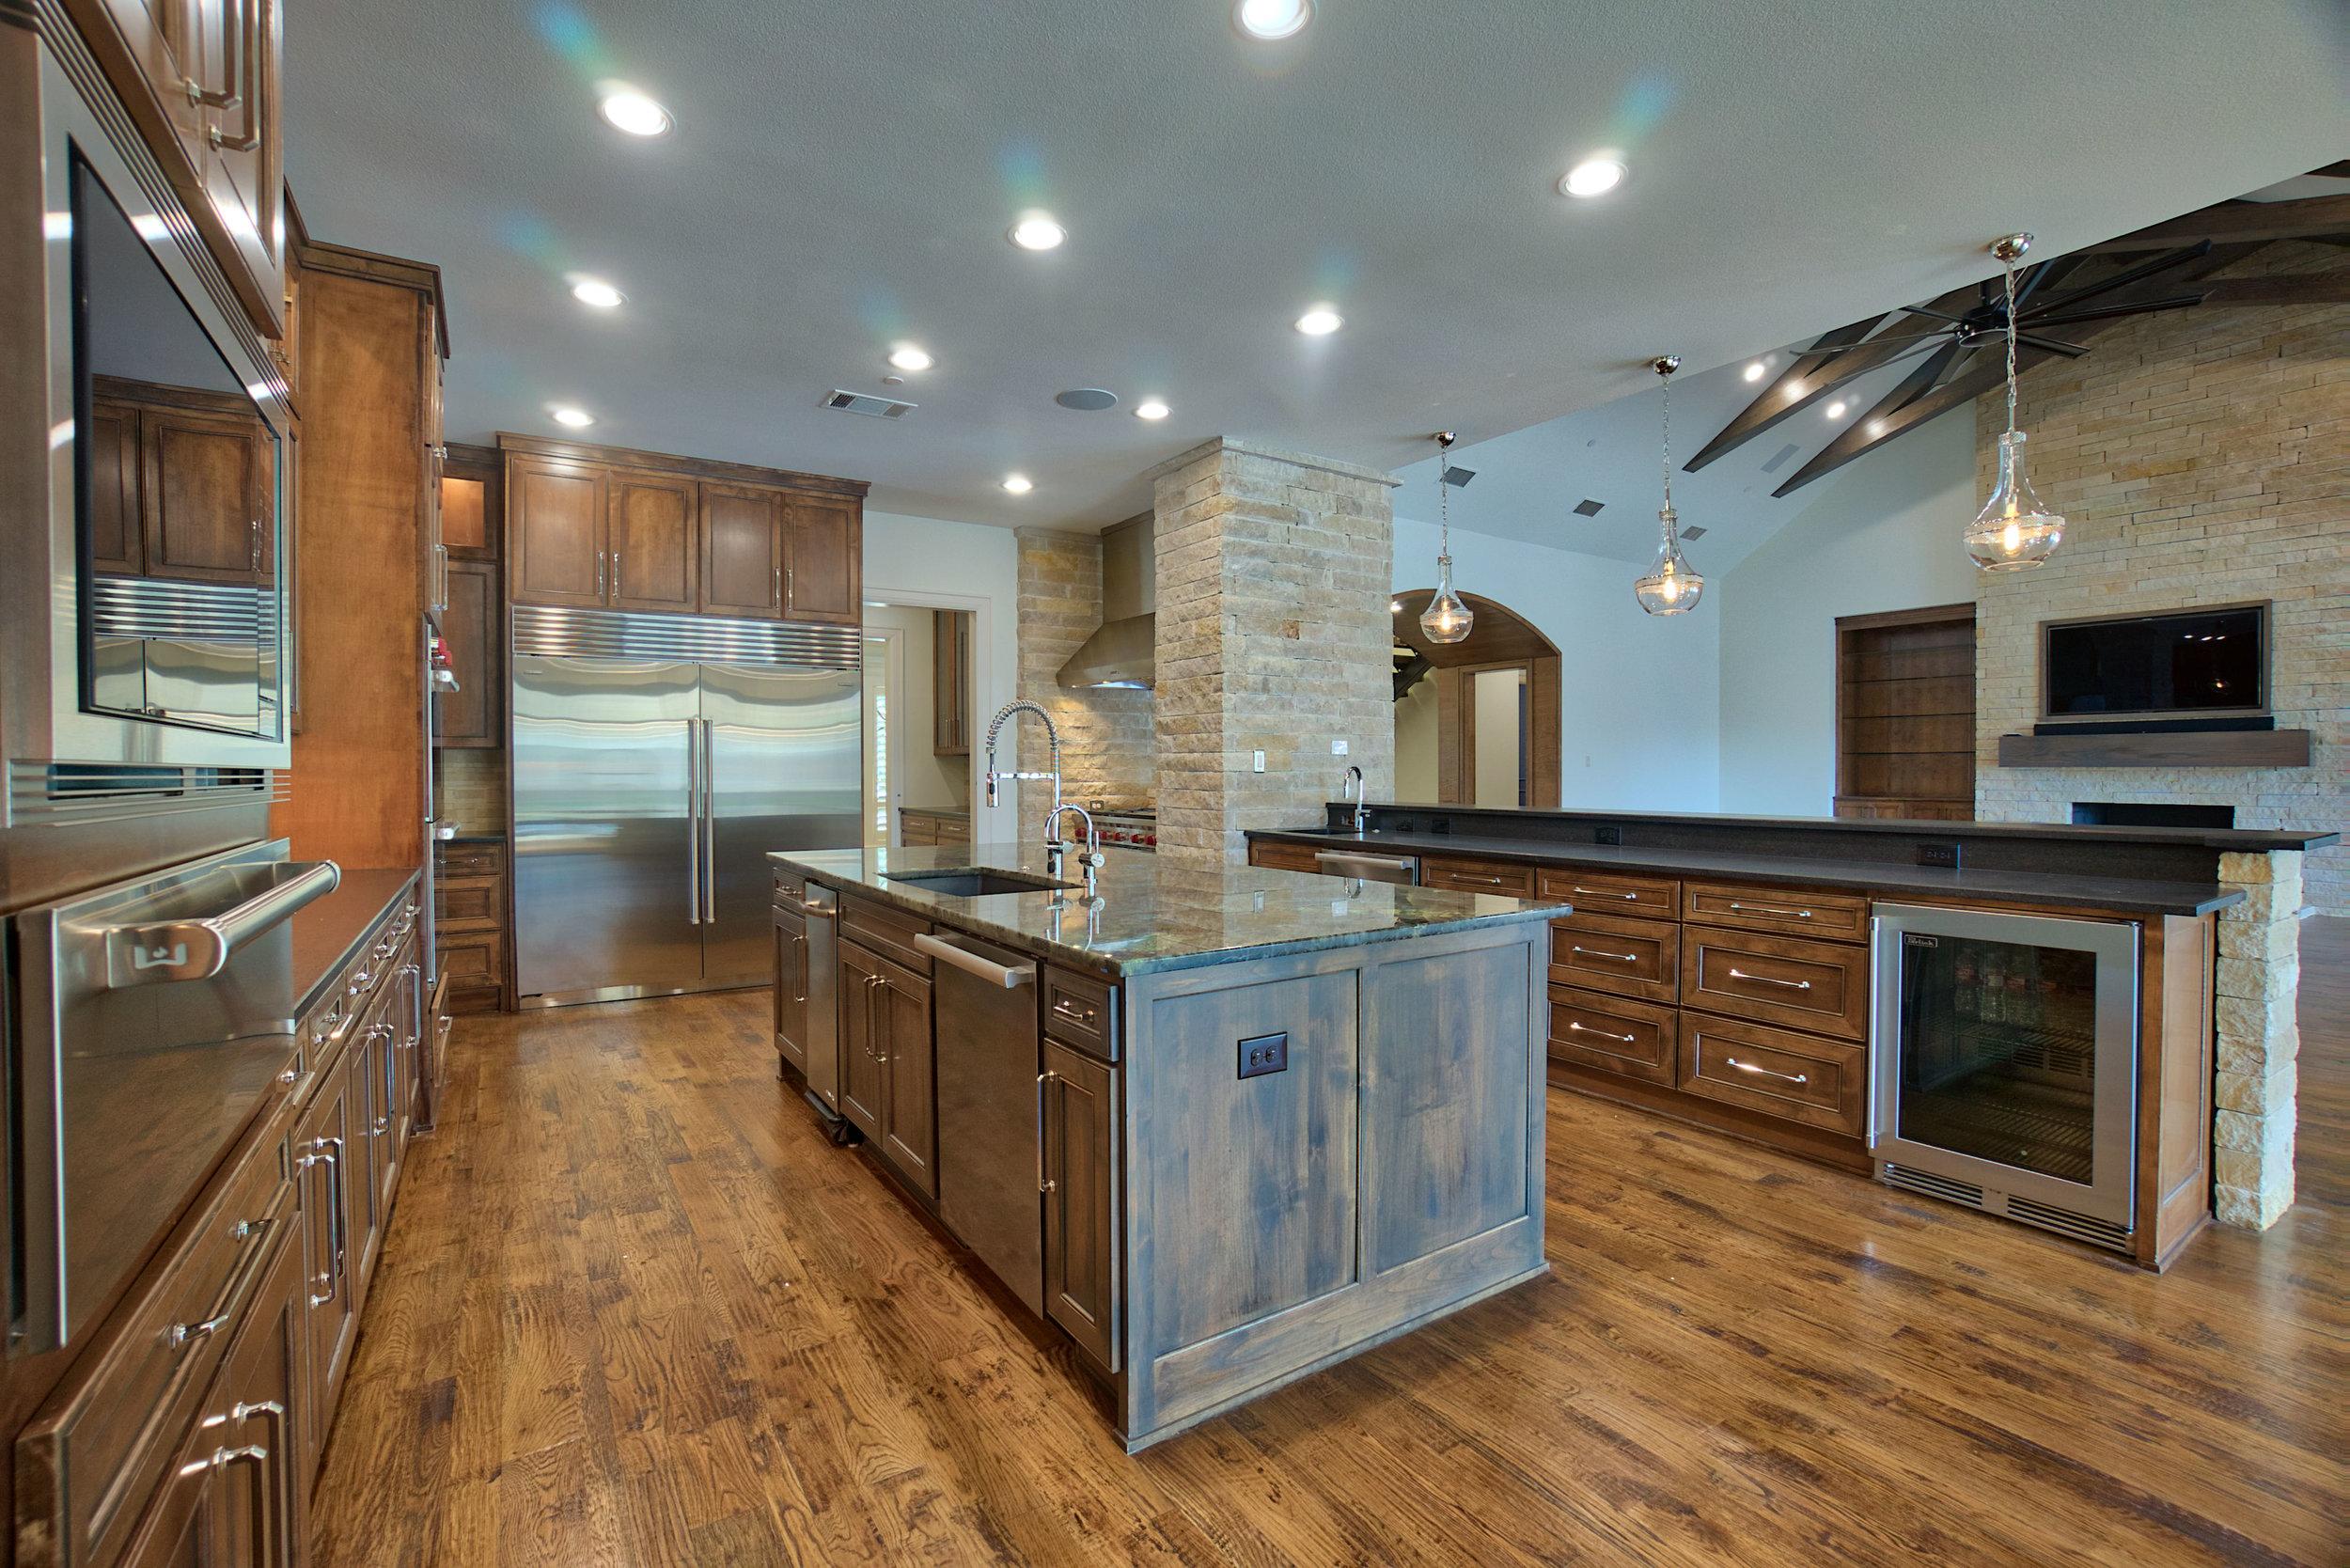 8 kitchen 1.jpeg